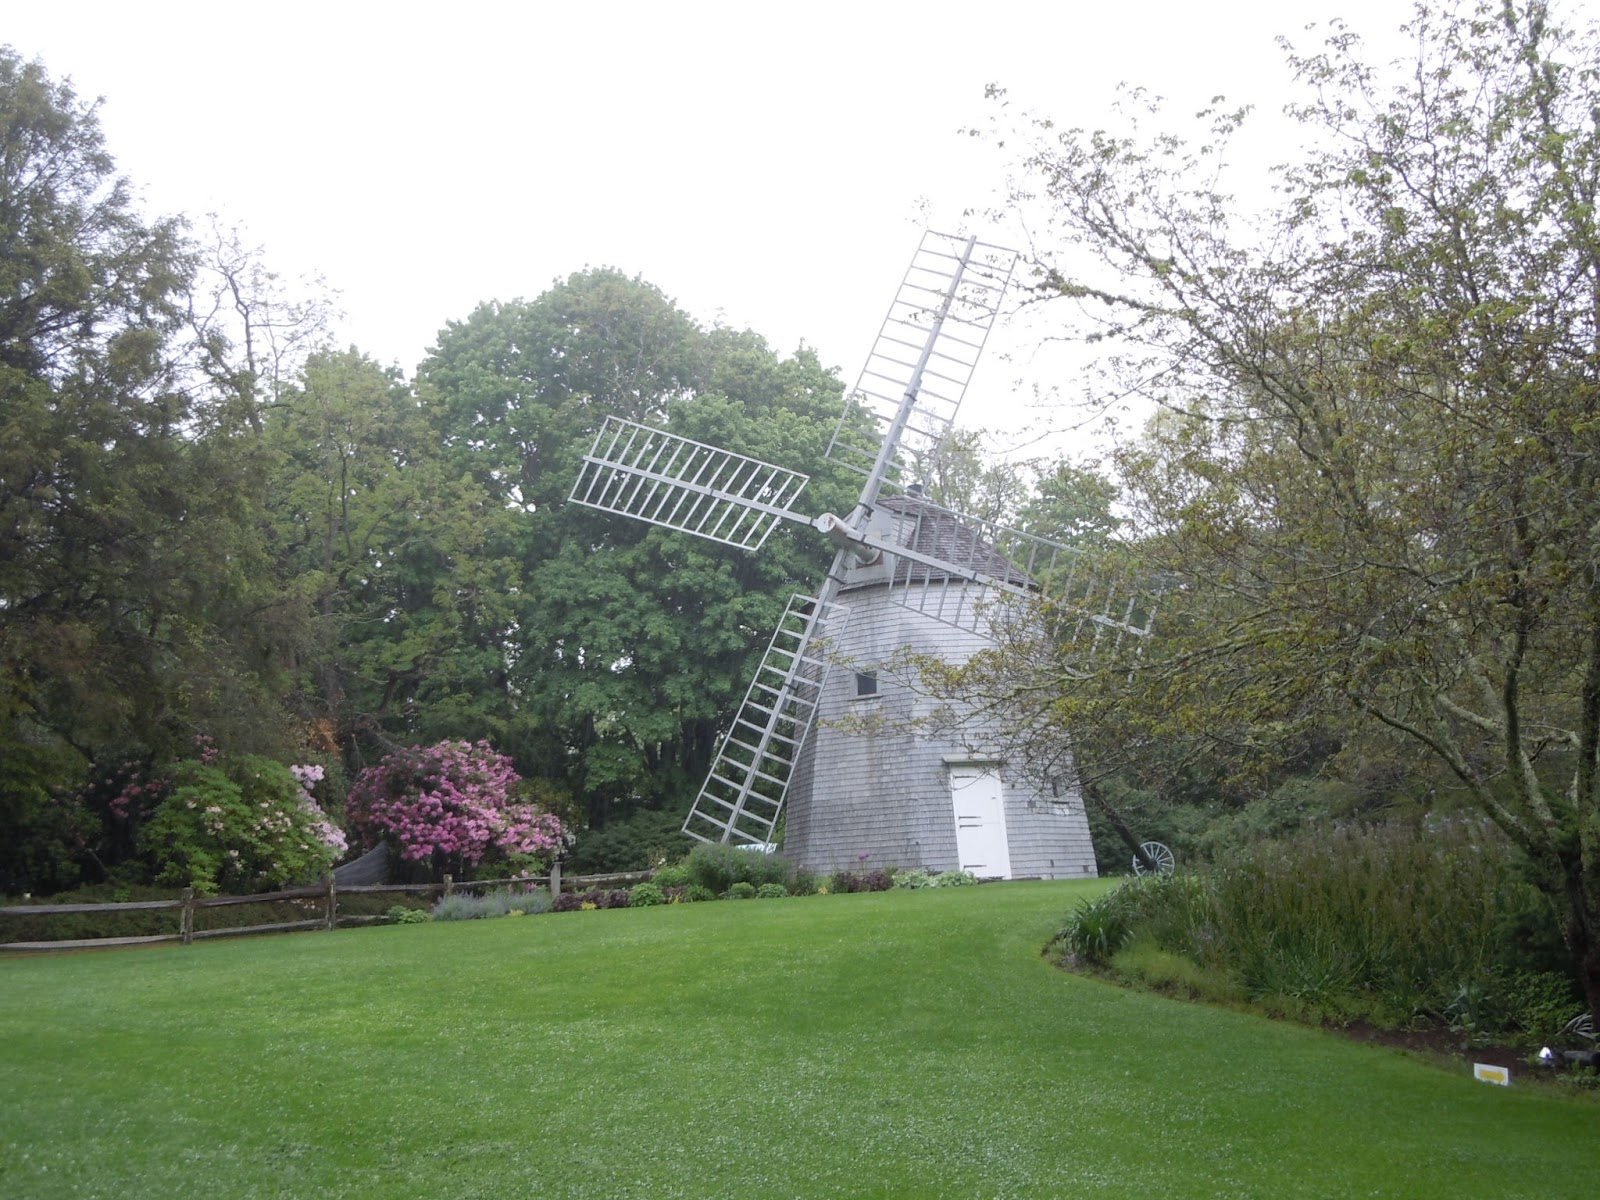 Heritage Gardens, Sandwich, MA 055.JPG